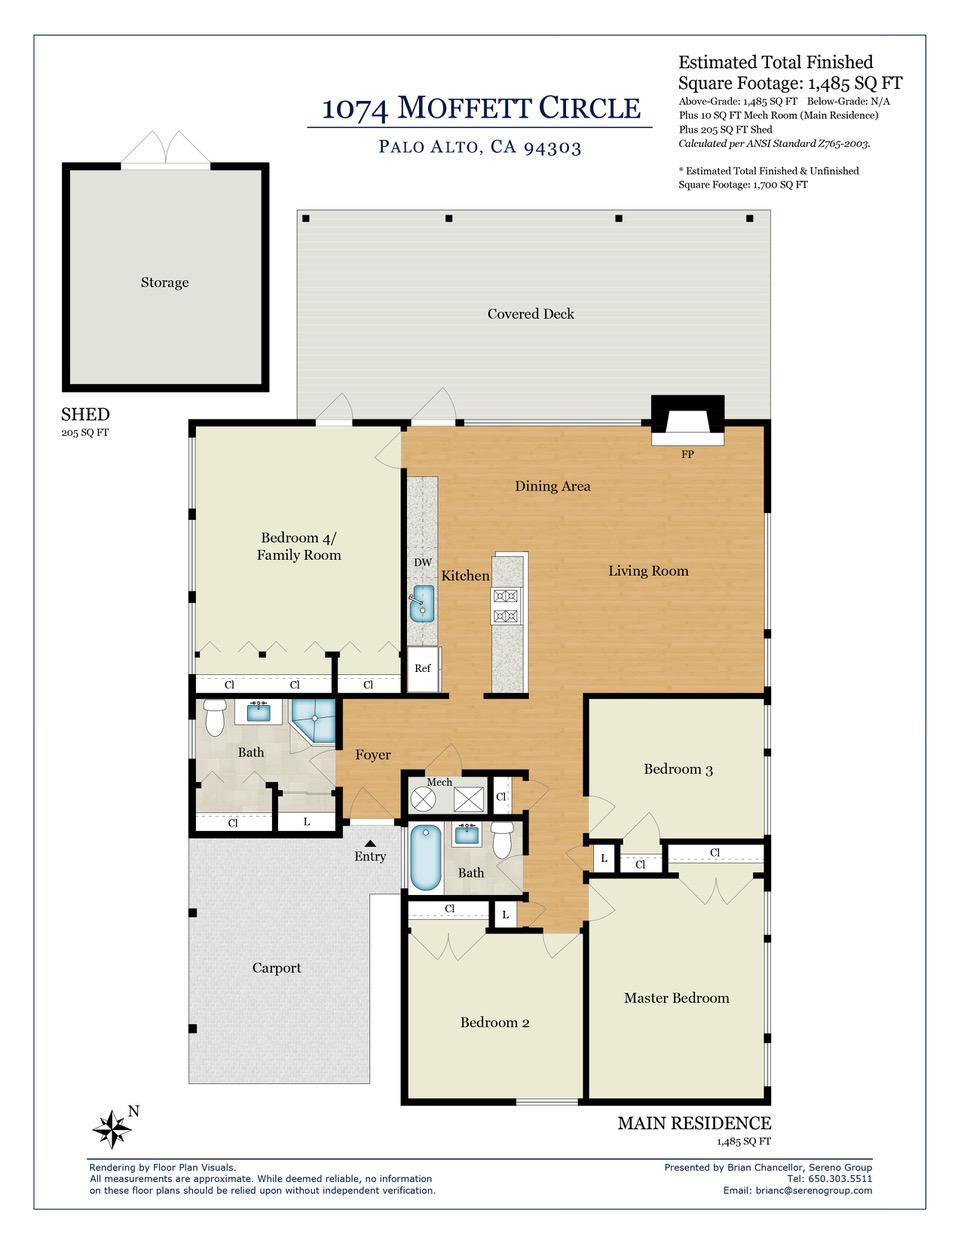 BC-1074MoffettCir-FloorPlan-Print-R1.jpeg